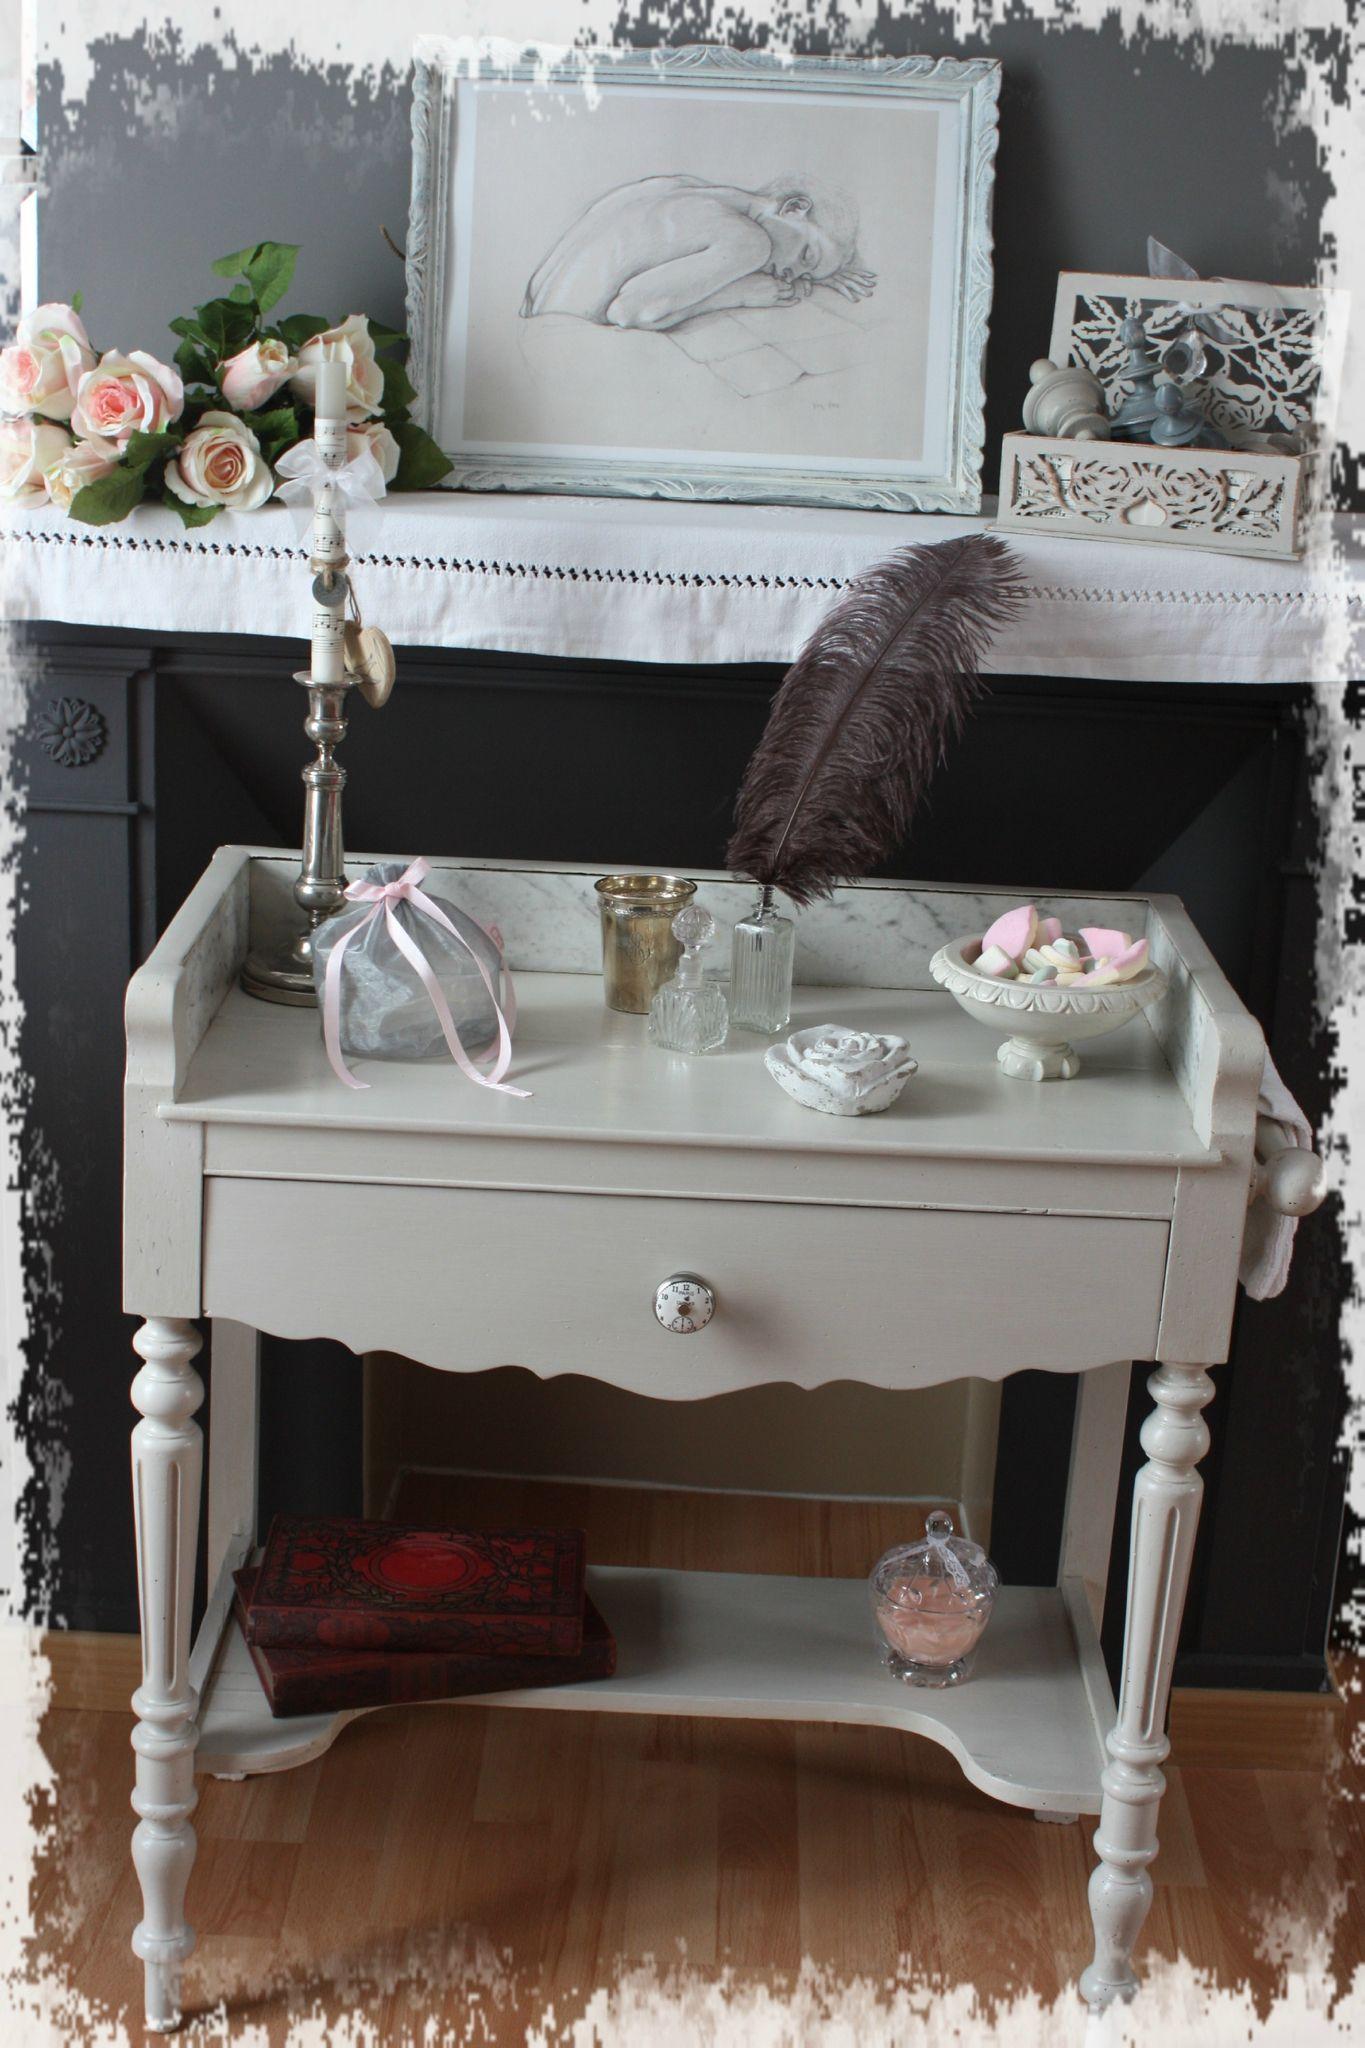 customiser une vieille table en bois. Black Bedroom Furniture Sets. Home Design Ideas